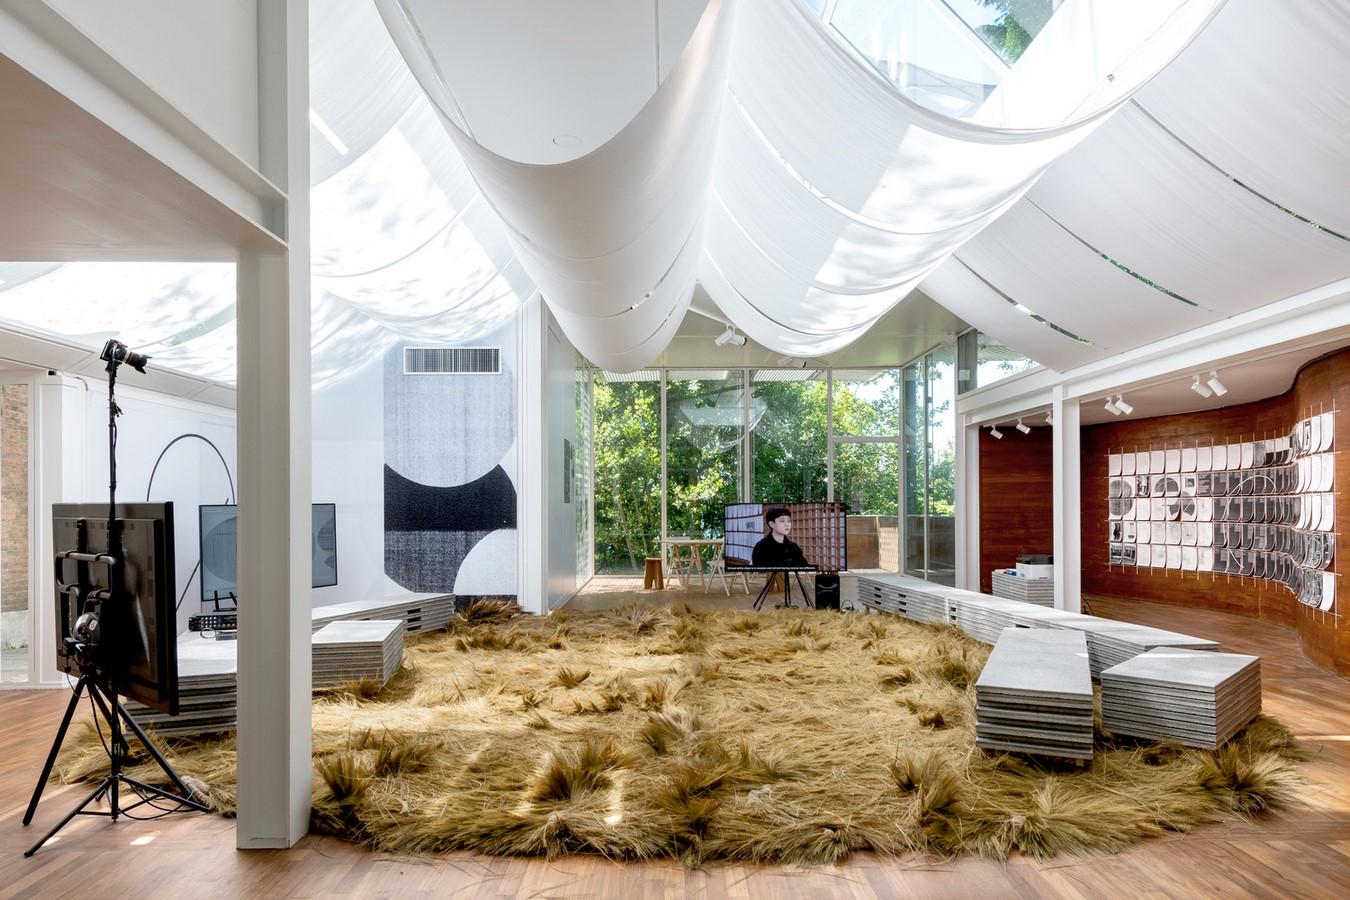 Korean Pavilion Reimagines Traditional Schools at the 2021 Venice Biennale Sheet8